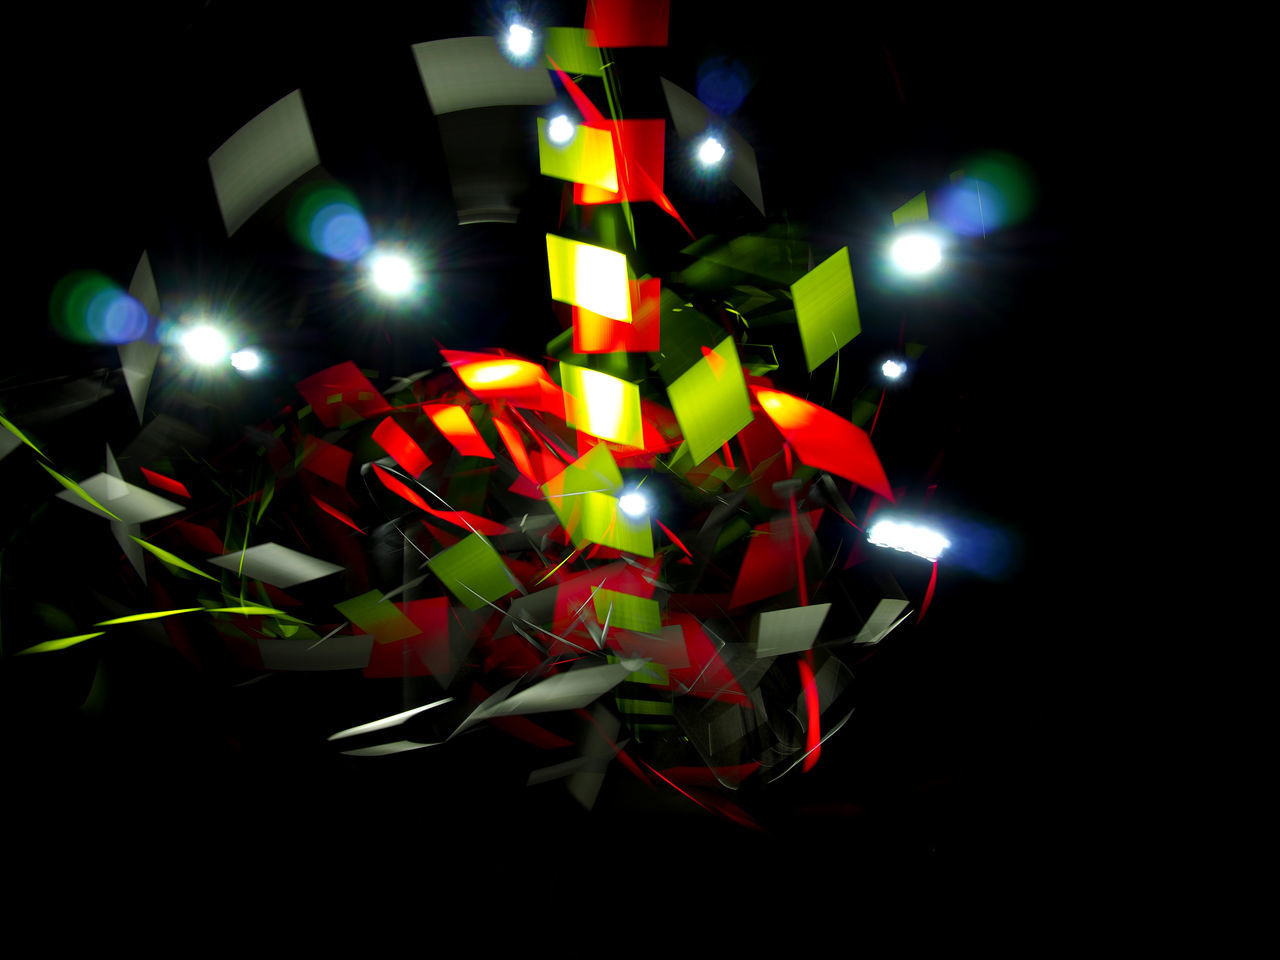 illuminated, multi colored, night, glowing, no people, lighting equipment, close-up, indoors, celebration, decoration, studio shot, light, holiday, art and craft, shape, light - natural phenomenon, christmas, black background, electricity, creativity